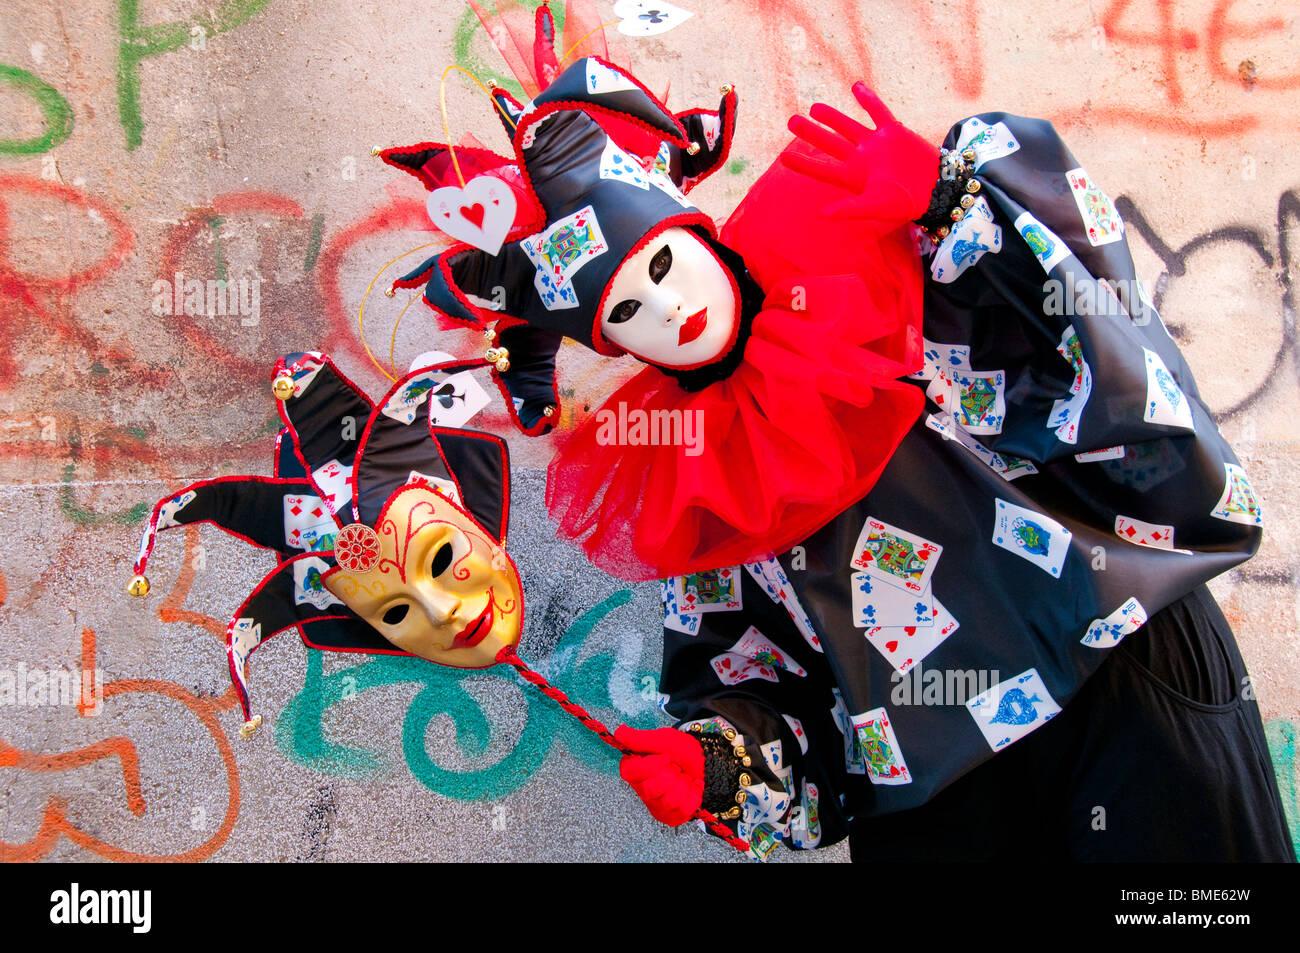 Venice Carnival, Italy, Costumed Jester joker participant Stock Photo